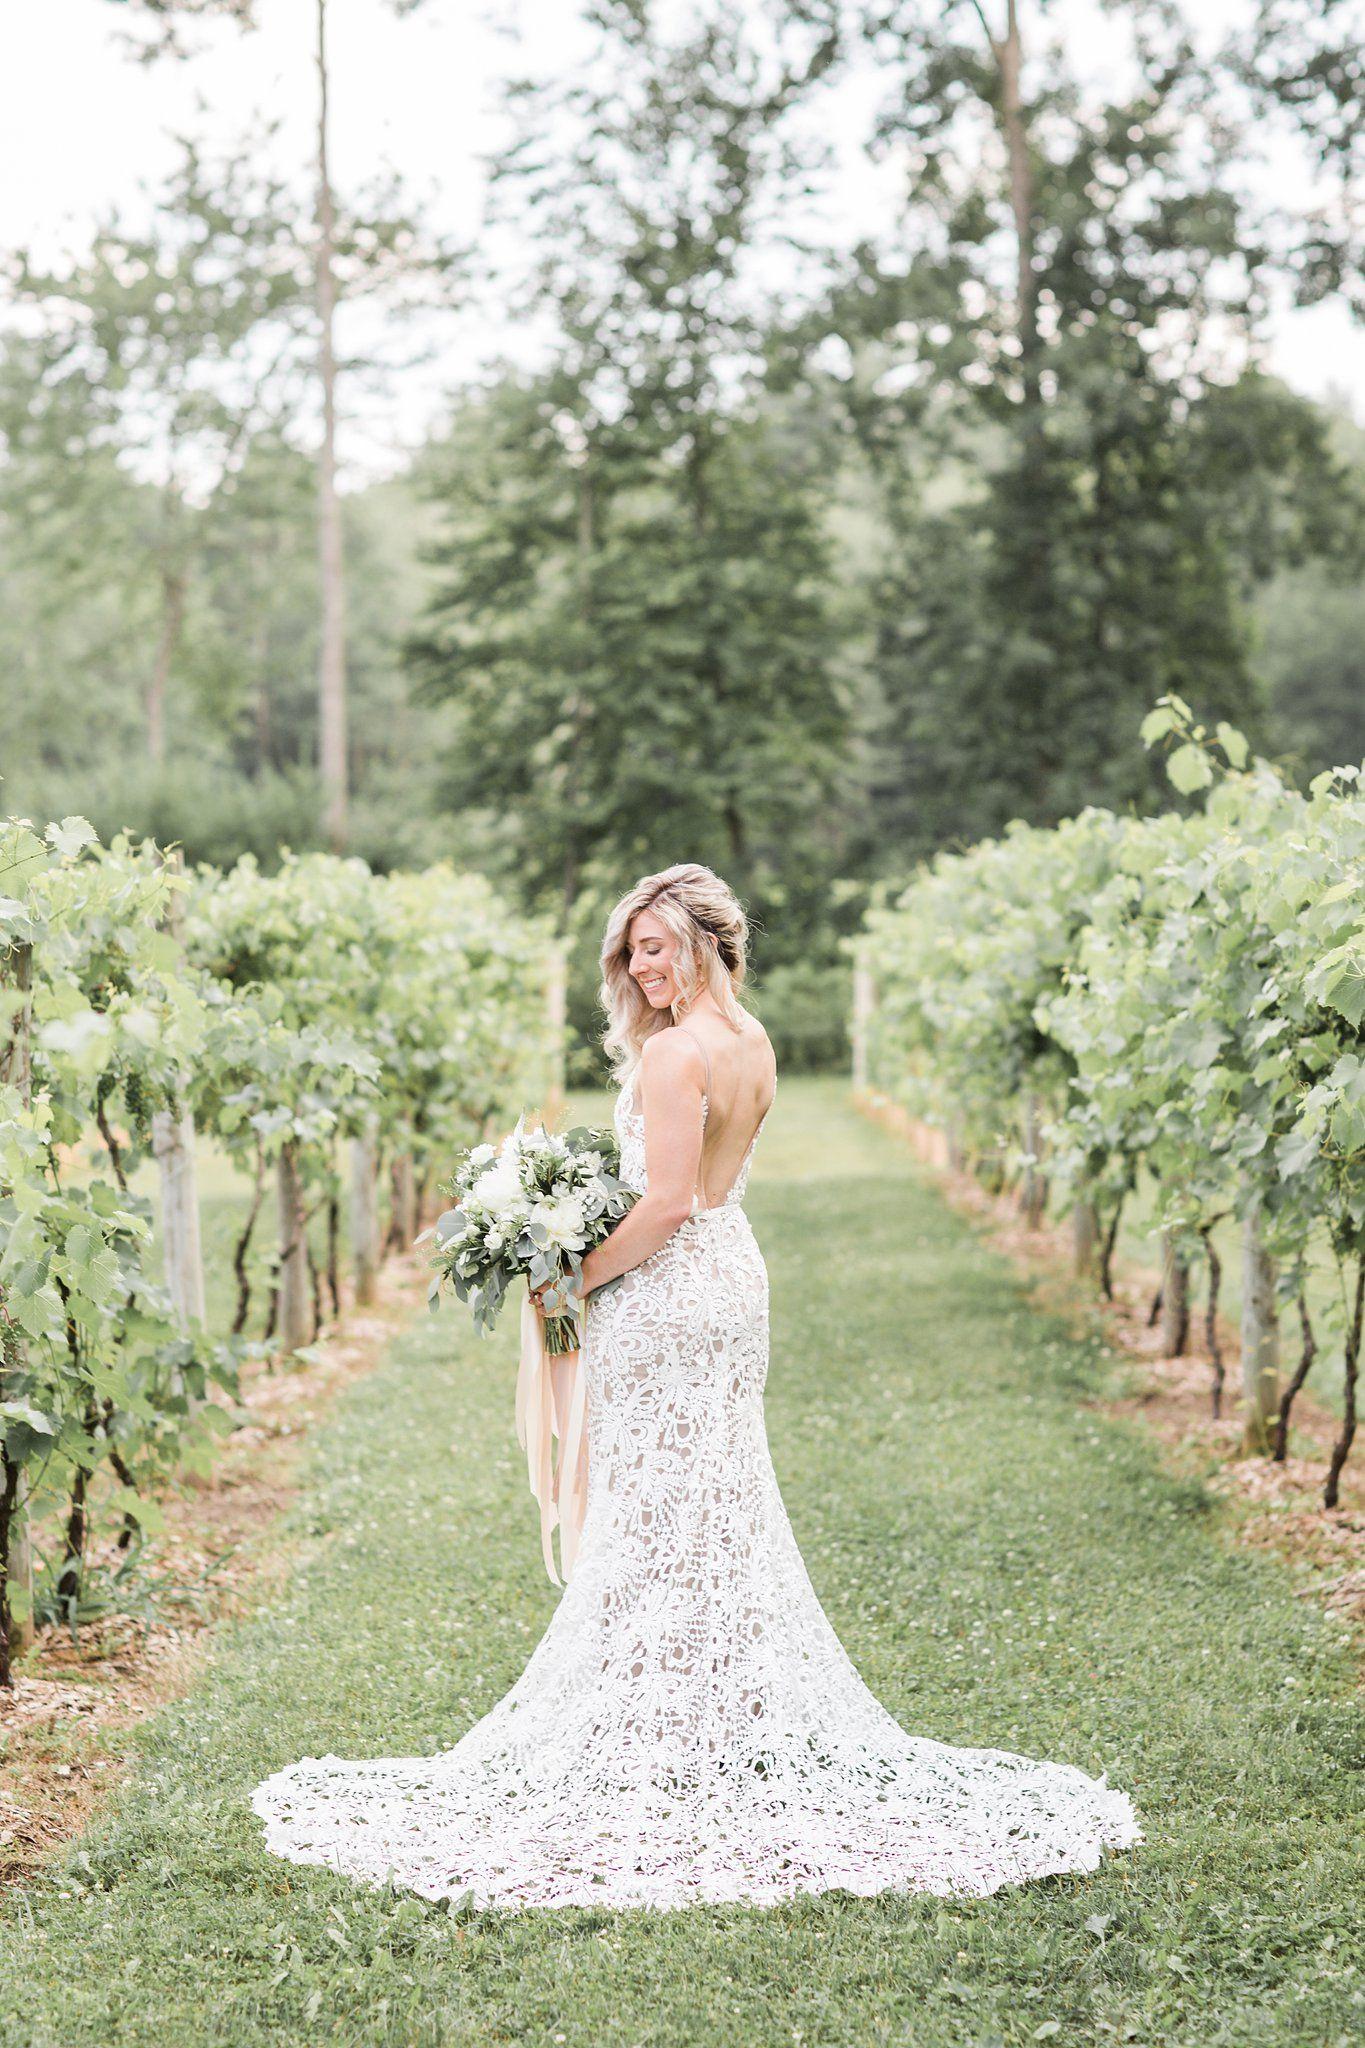 Zorvino Vineyards Wedding Madison Tyler In 2020 Vineyard Wedding Dress Cape Wedding Dress Vineyard Wedding